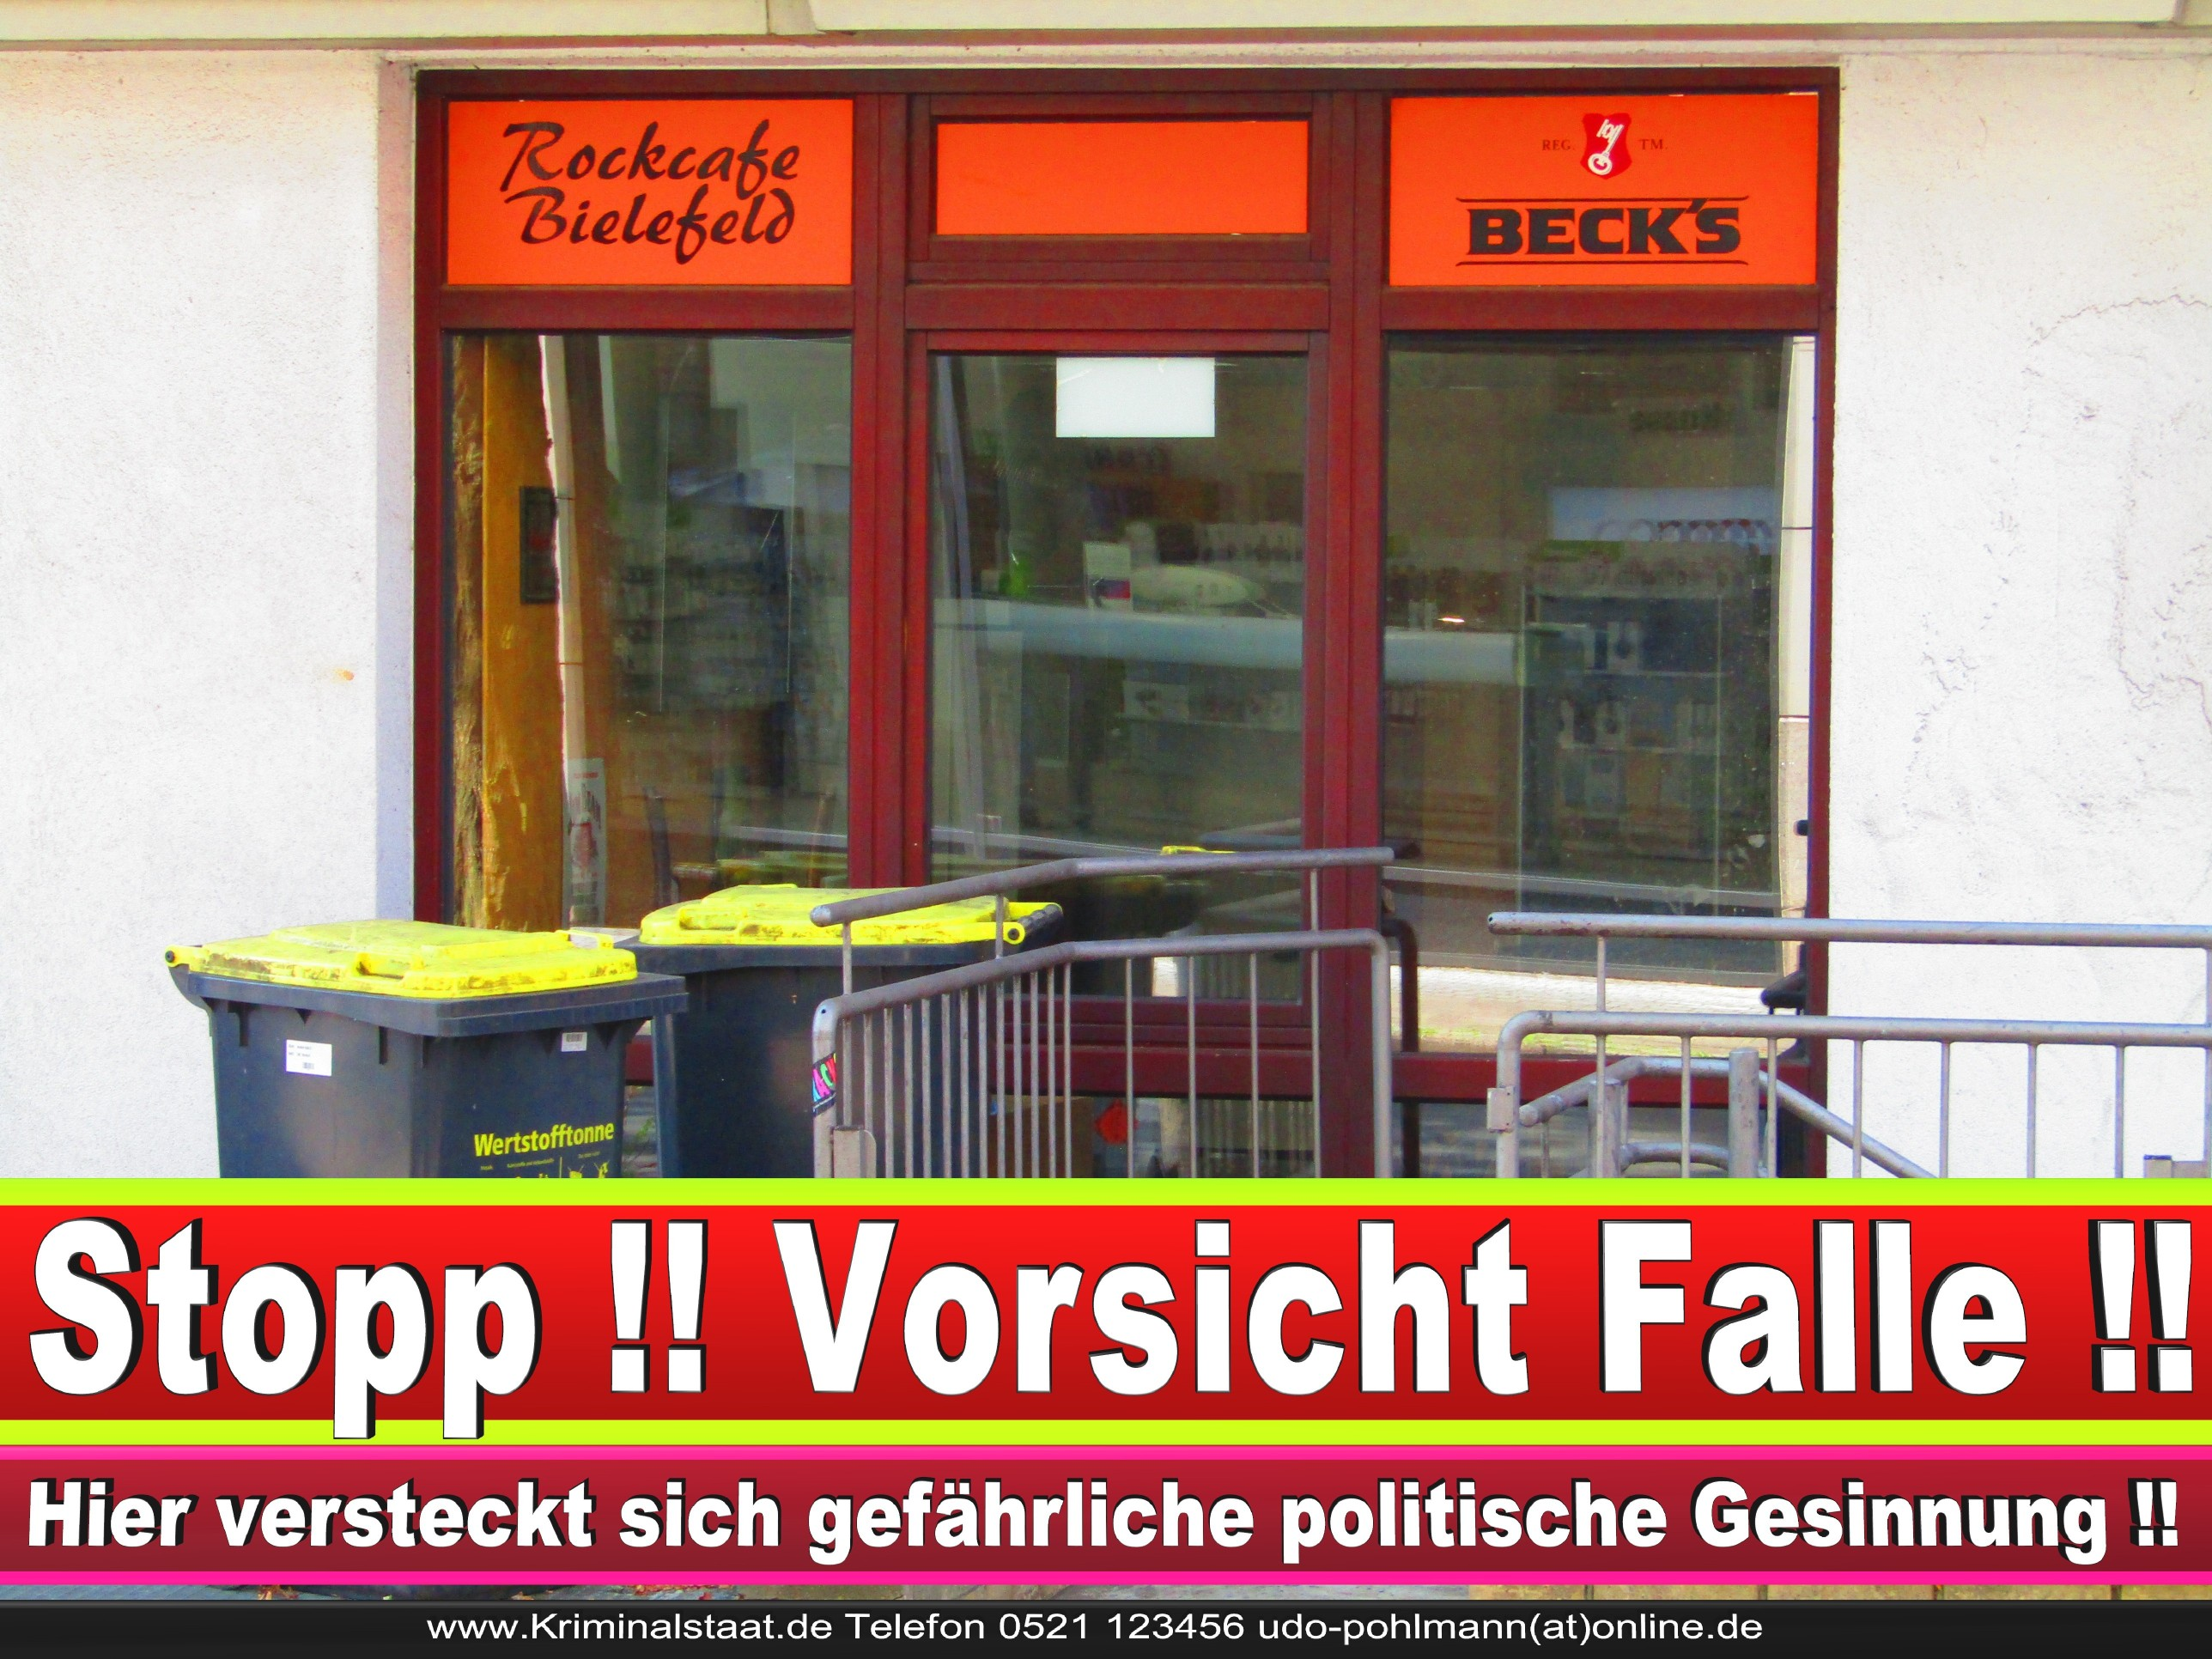 ROCK CAFE BIELEFELD CDU BIELEFELD Inhaber Niklas Meyer Und Markus Prange 1 LANDTAGSWAHL BUNDESTAGSWAHL BÜRGERMEISTERWAHL